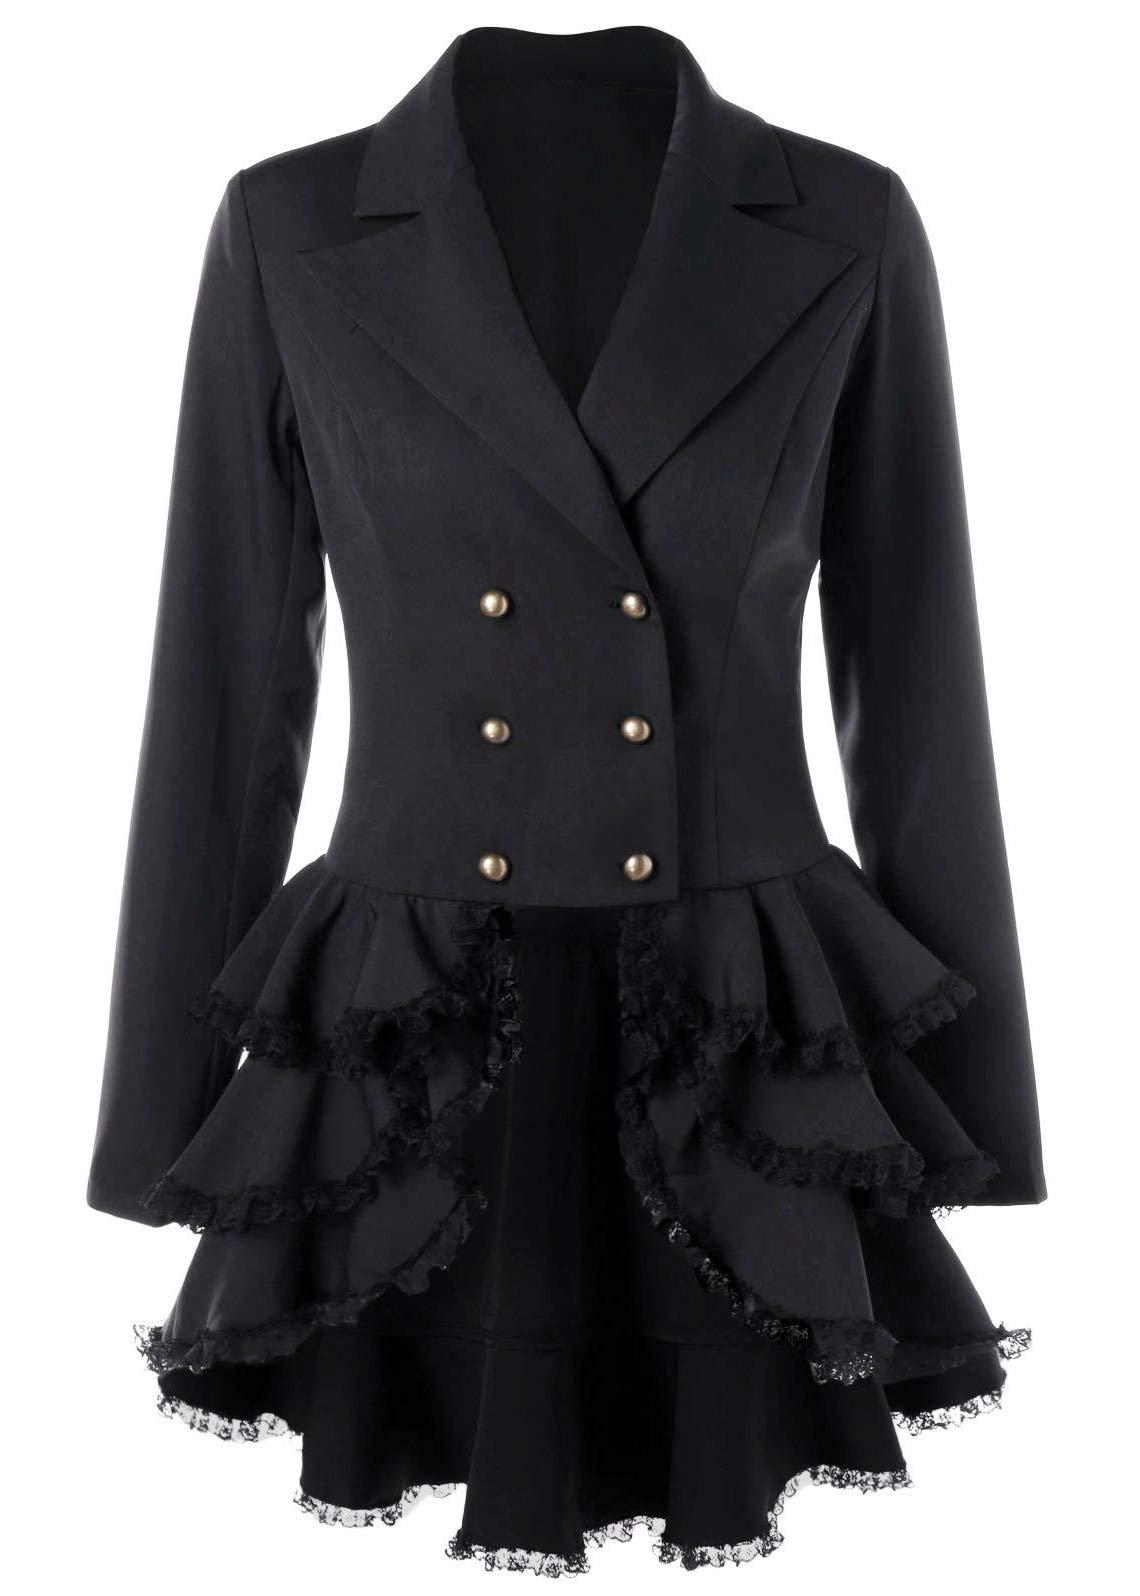 Nihsatin Women's Double Breasted Victorian Steampunk Blazer Coat Jacket with Lace Hem 3